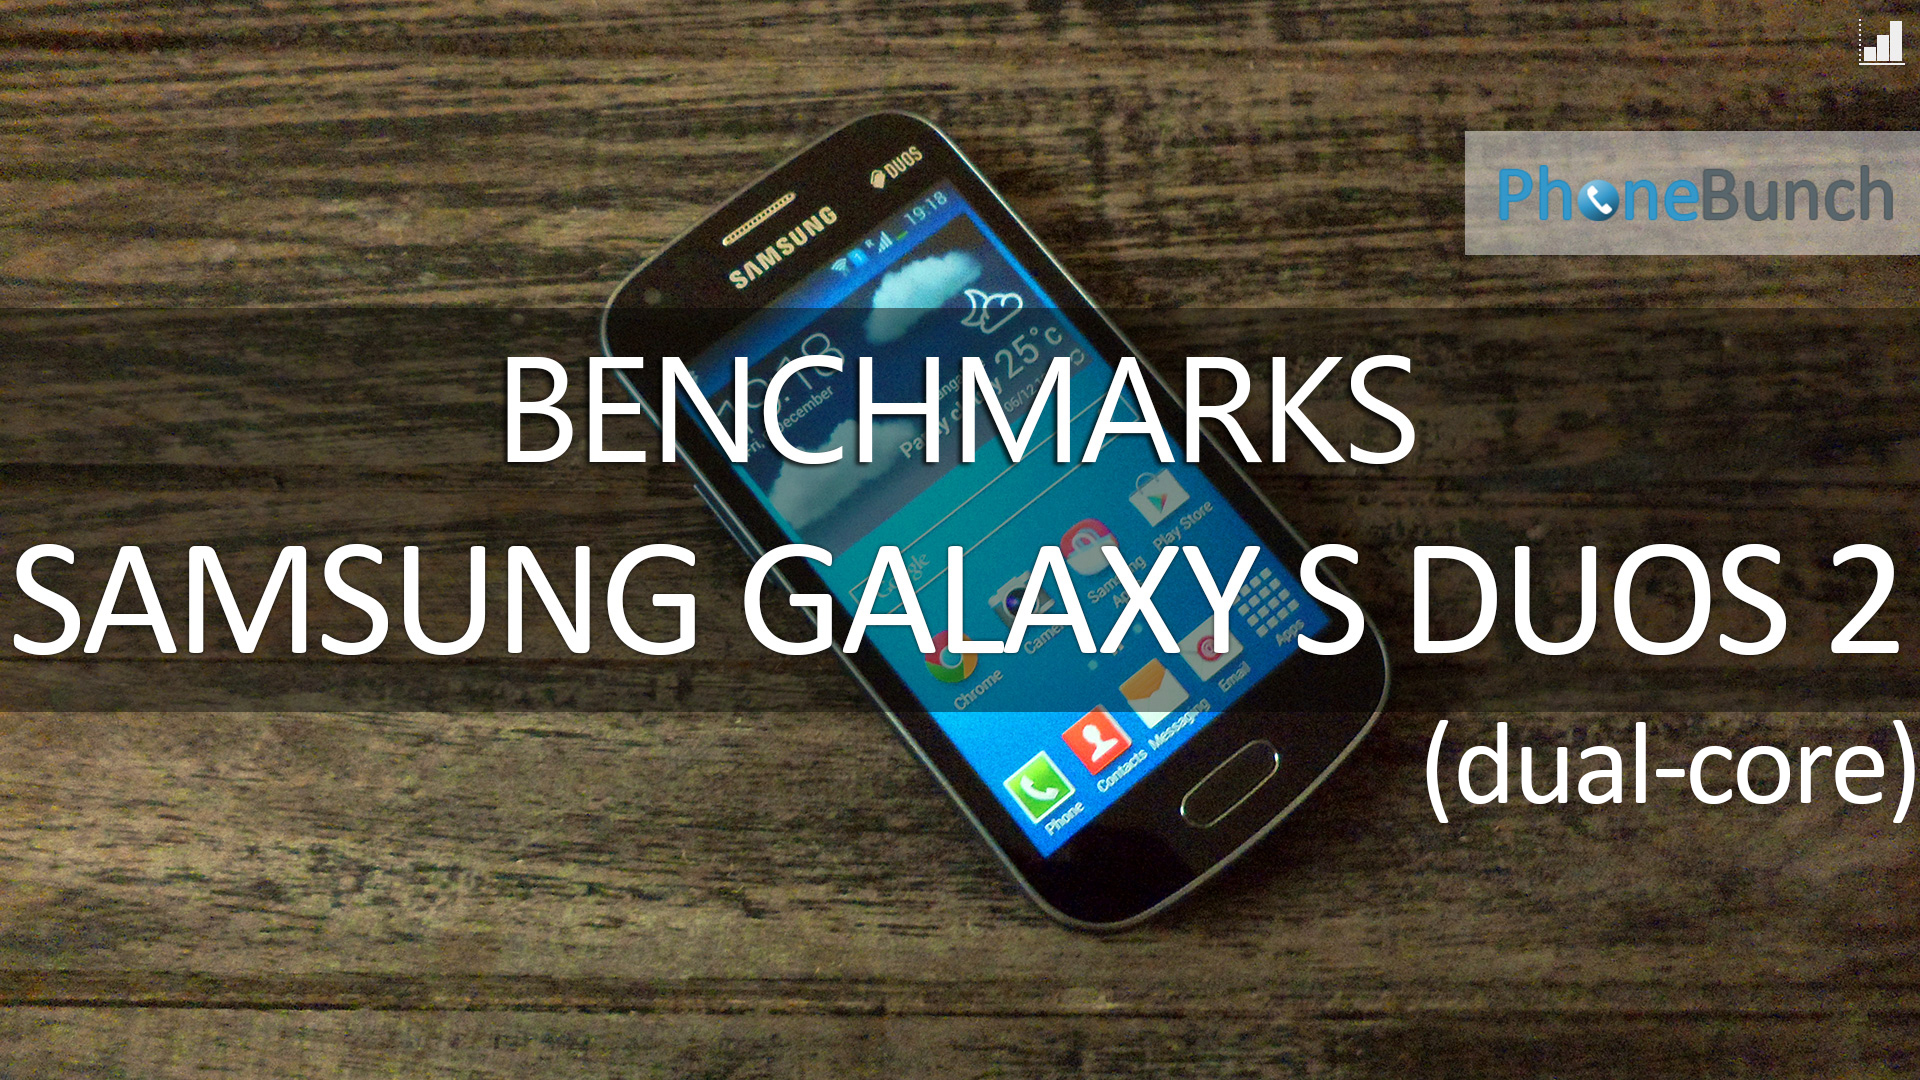 Samsung Galaxy S Duos 2 Benchmark